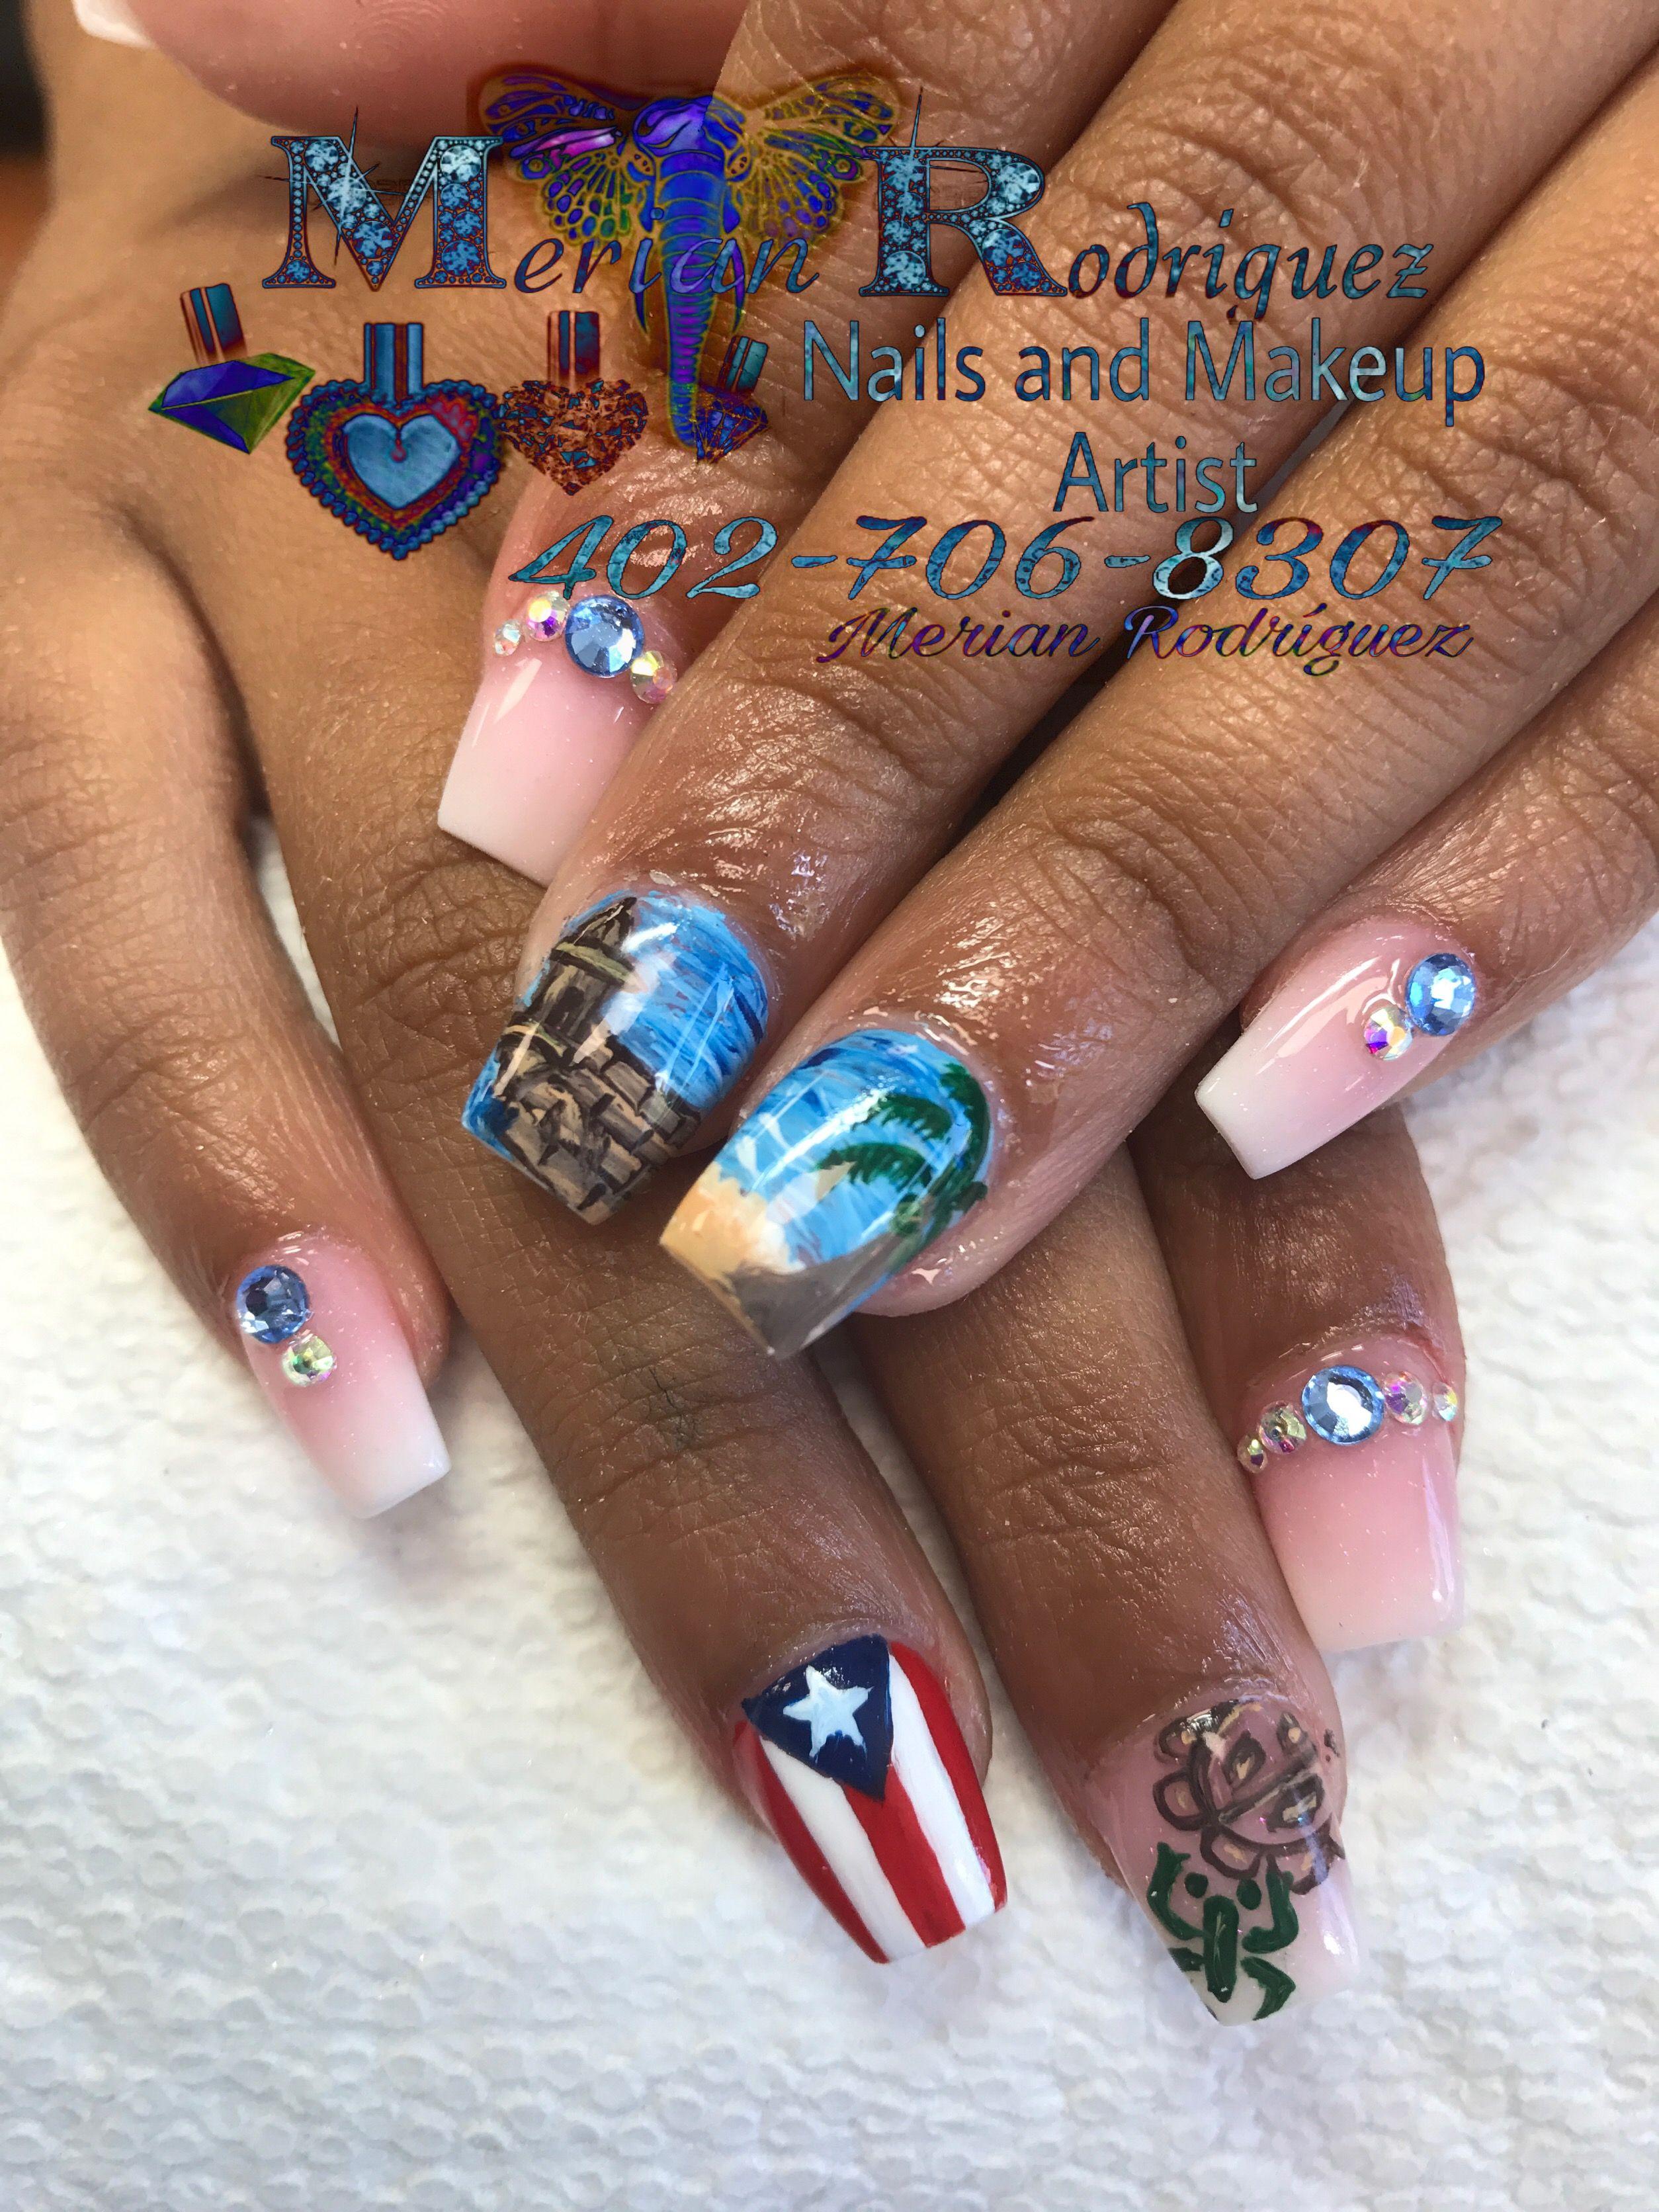 Puerto Rico Nail Art By Merian Rodriguez Merianrdrgz1gmail